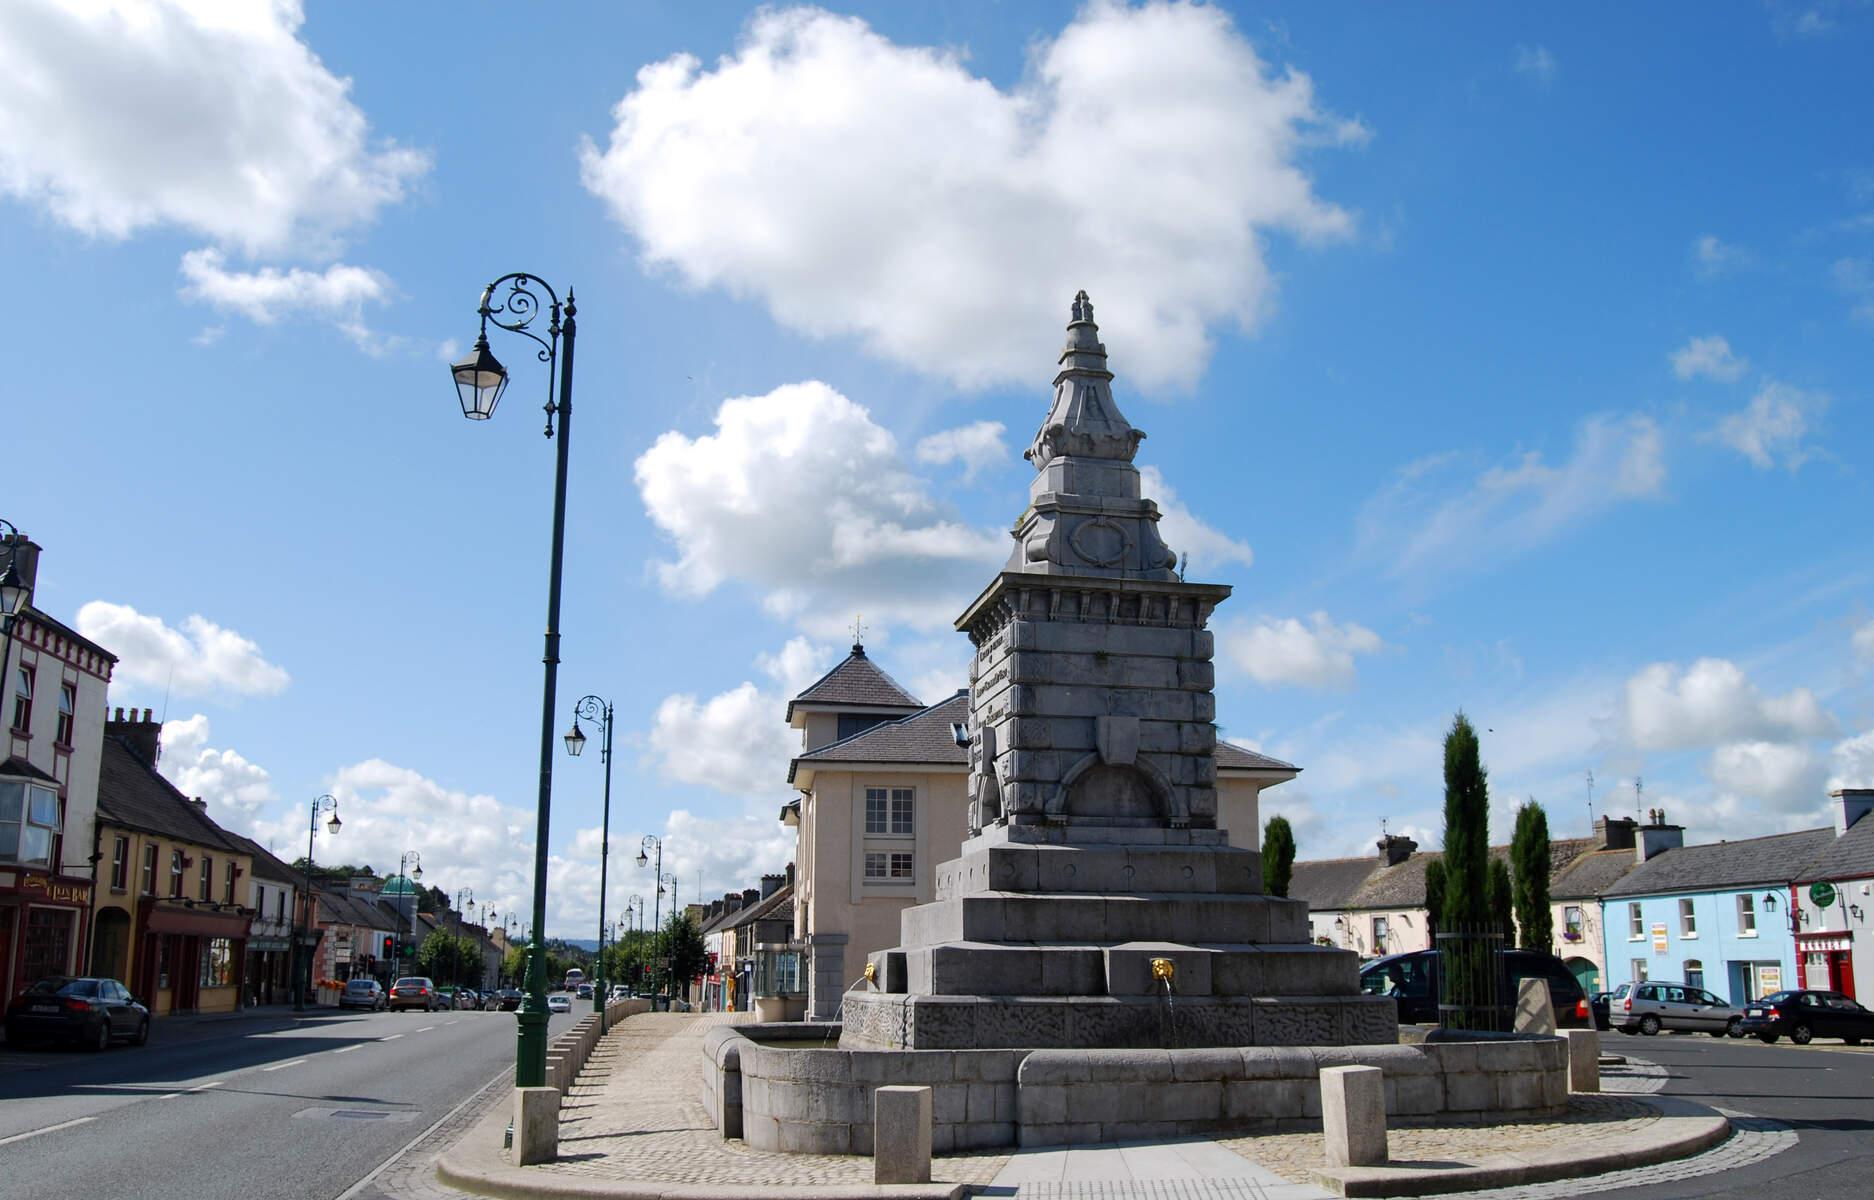 Abbeyleix County Laois